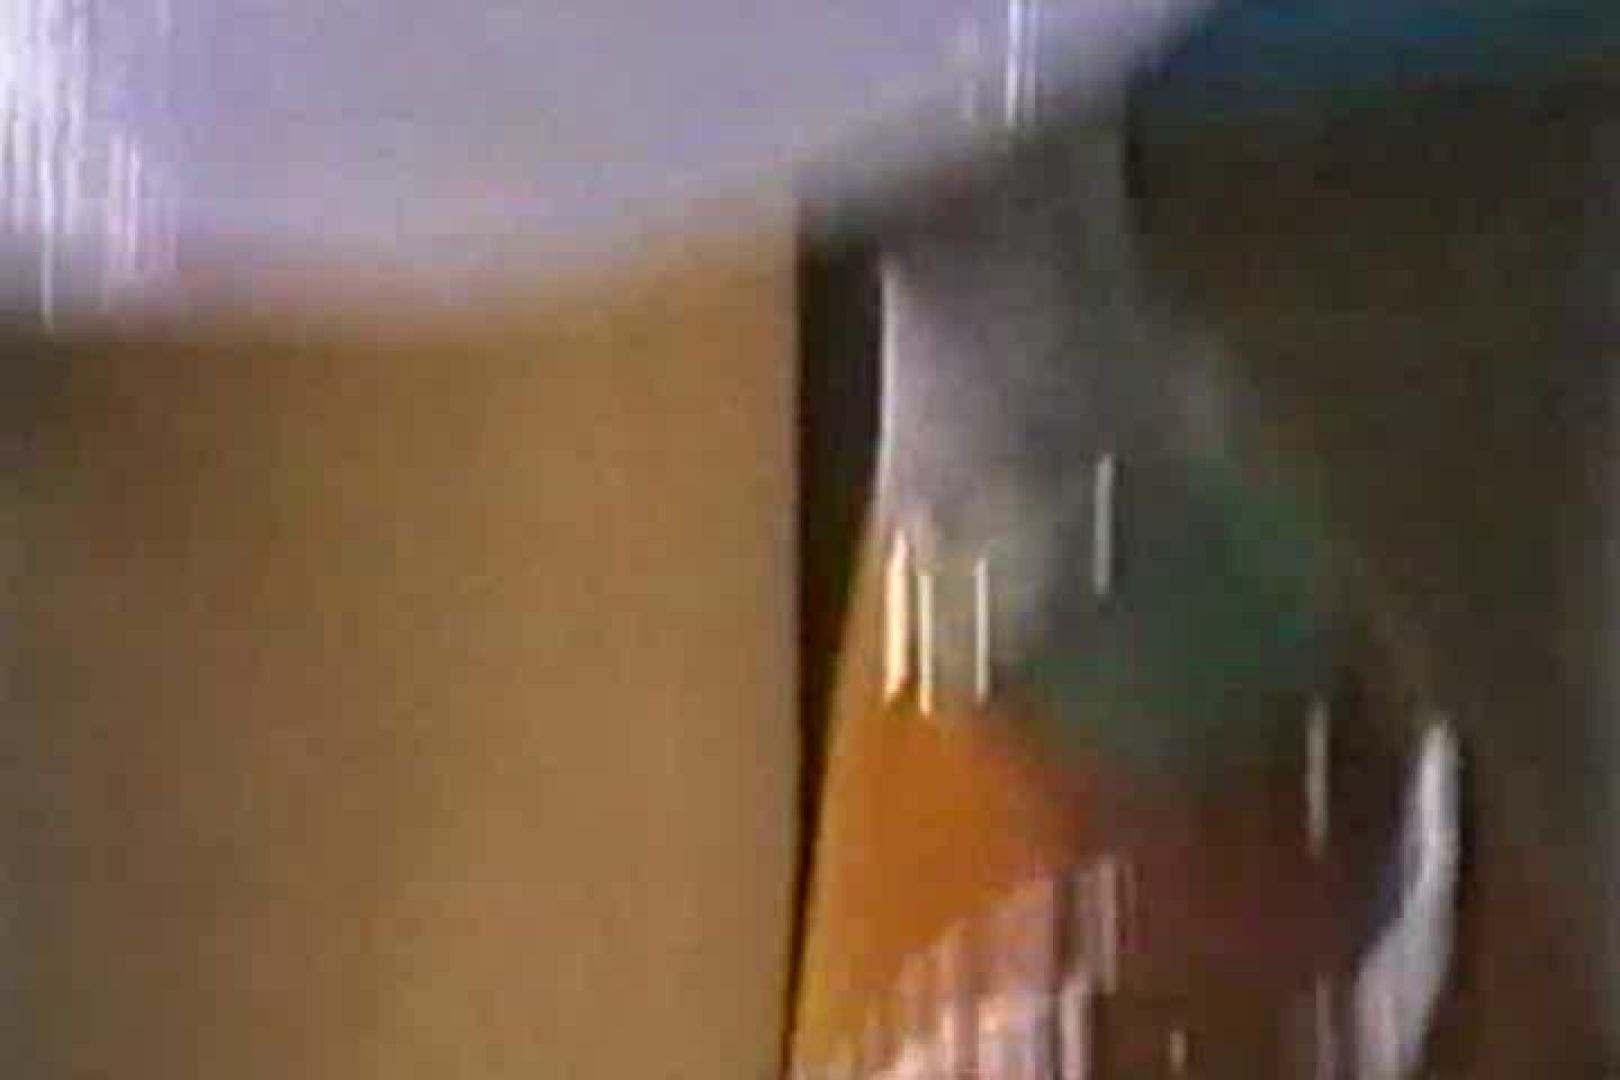 RQカメラ地獄Vol.18 車でエッチ  60PIX 56